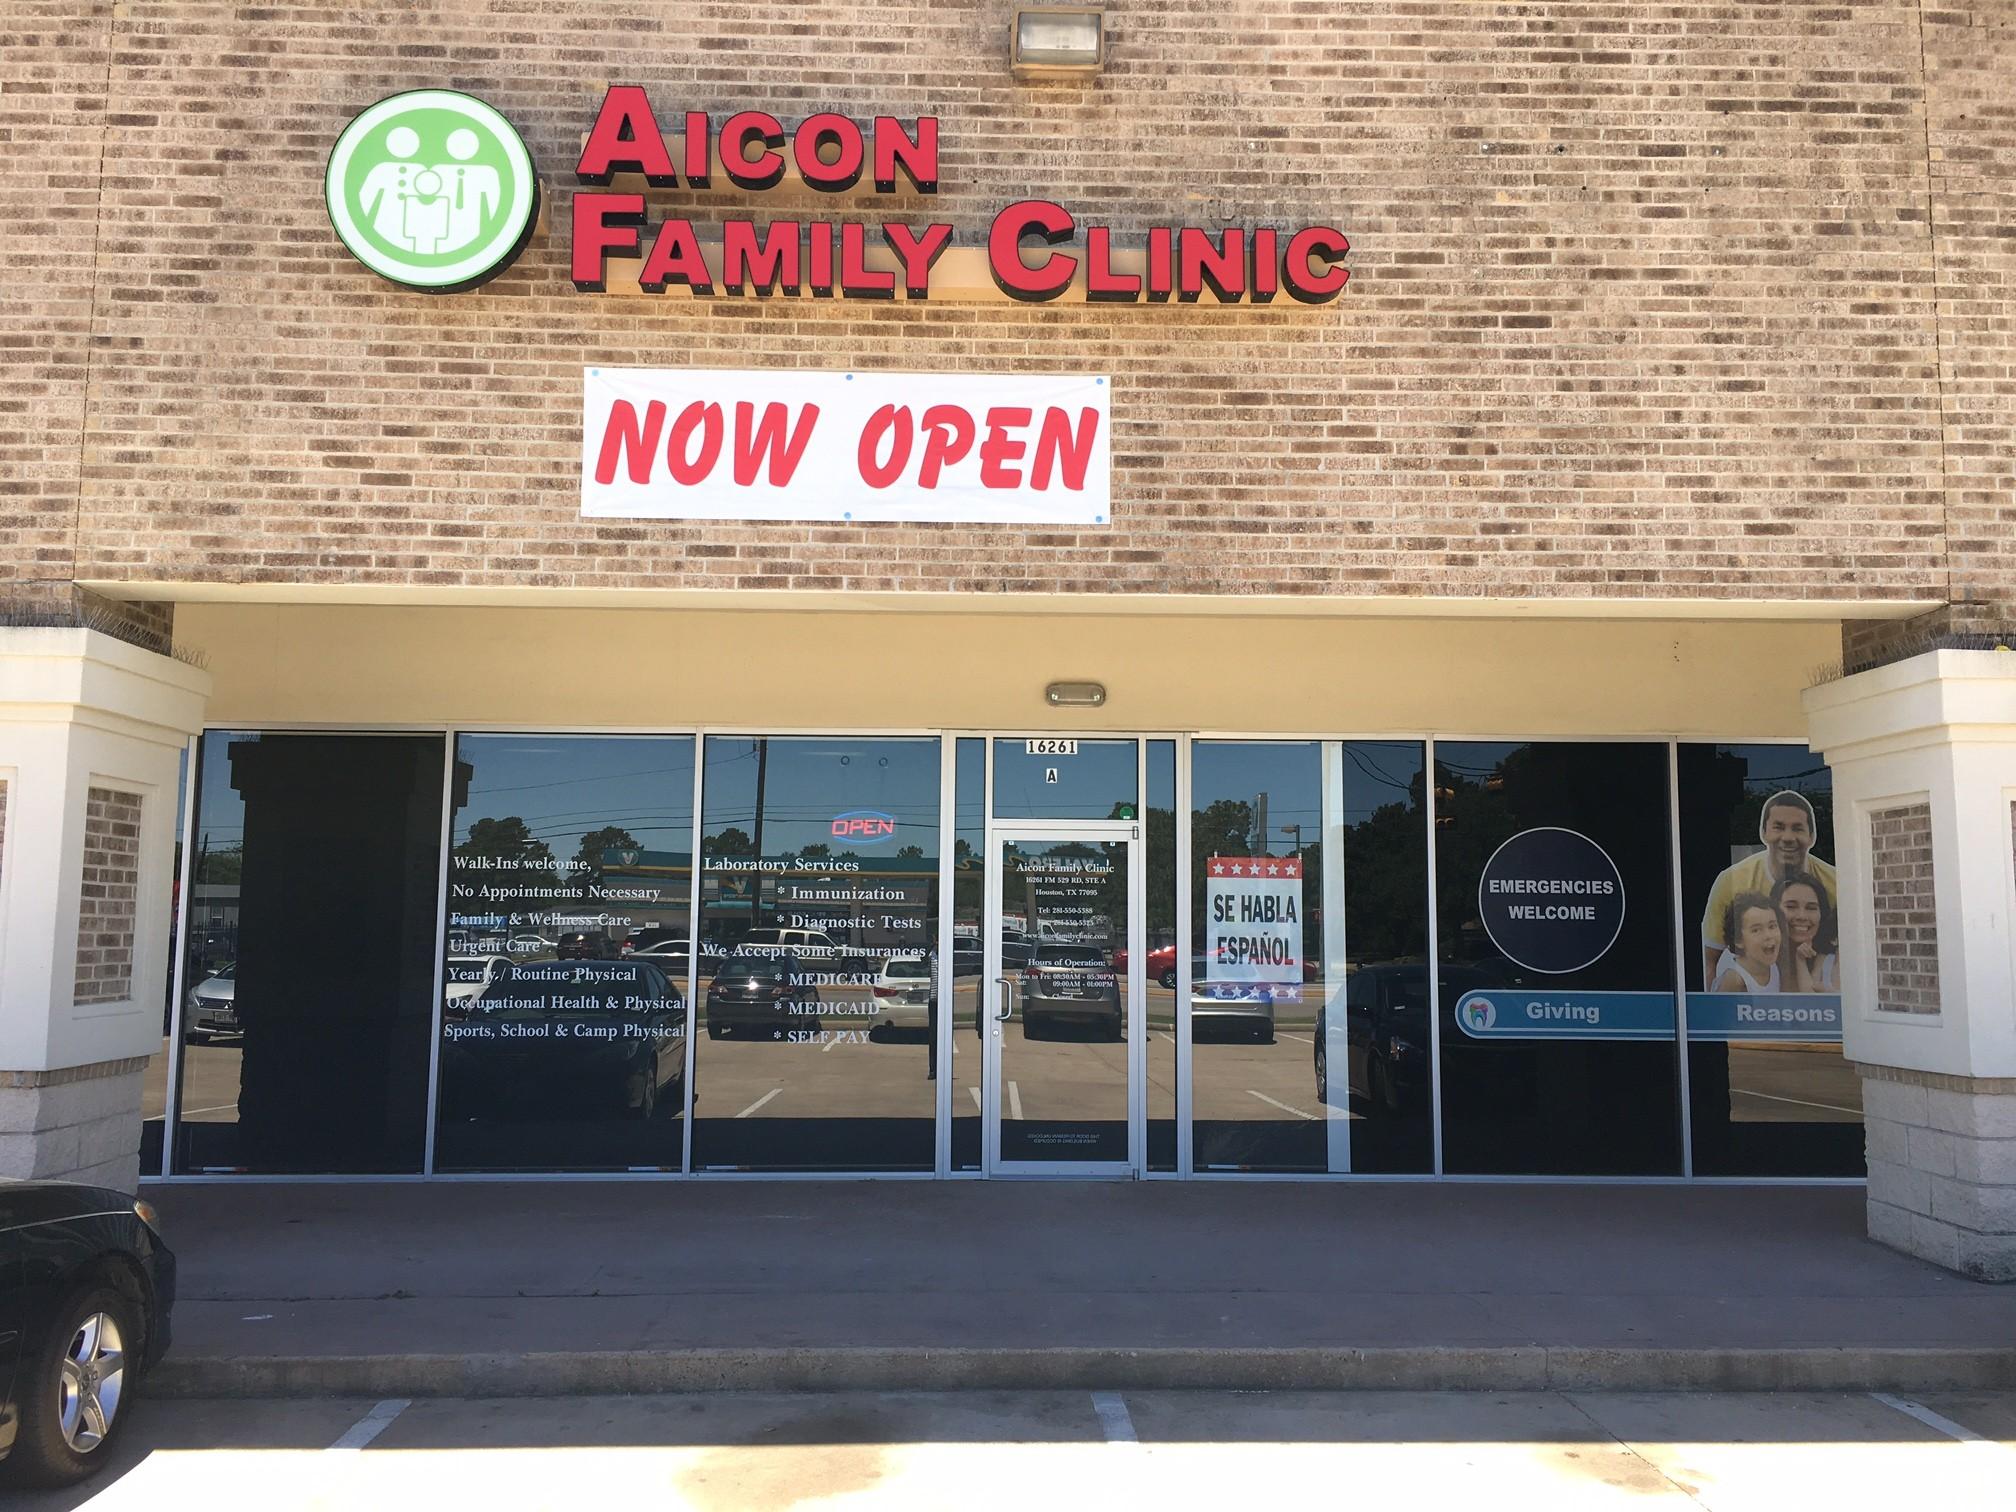 Aicon Family Clinic | LinkedIn